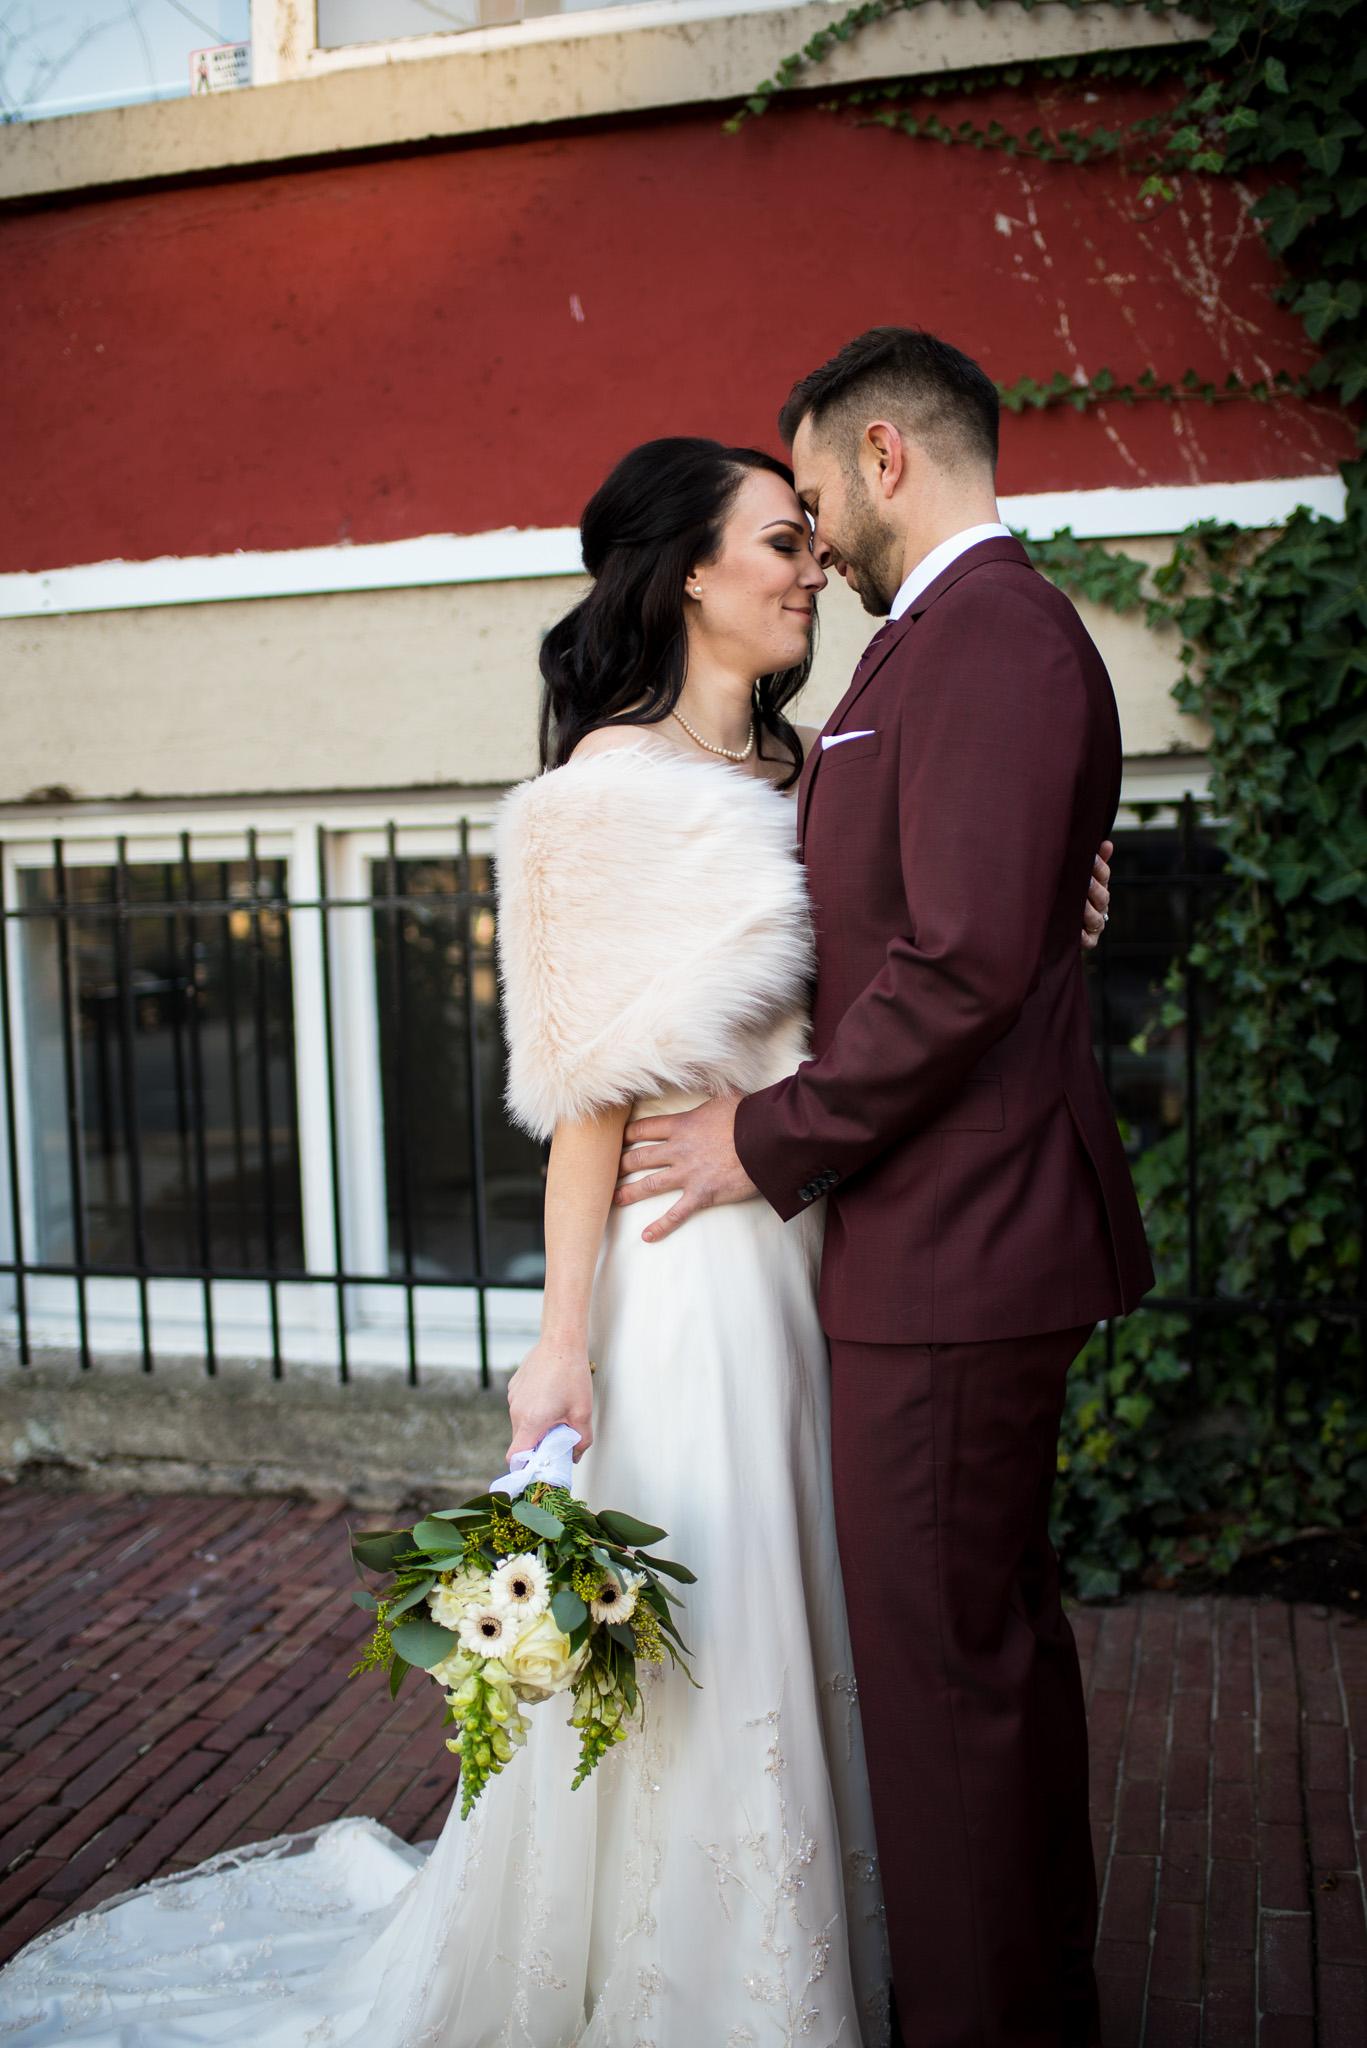 Brix and Mortar Wedding Photos-46.jpg